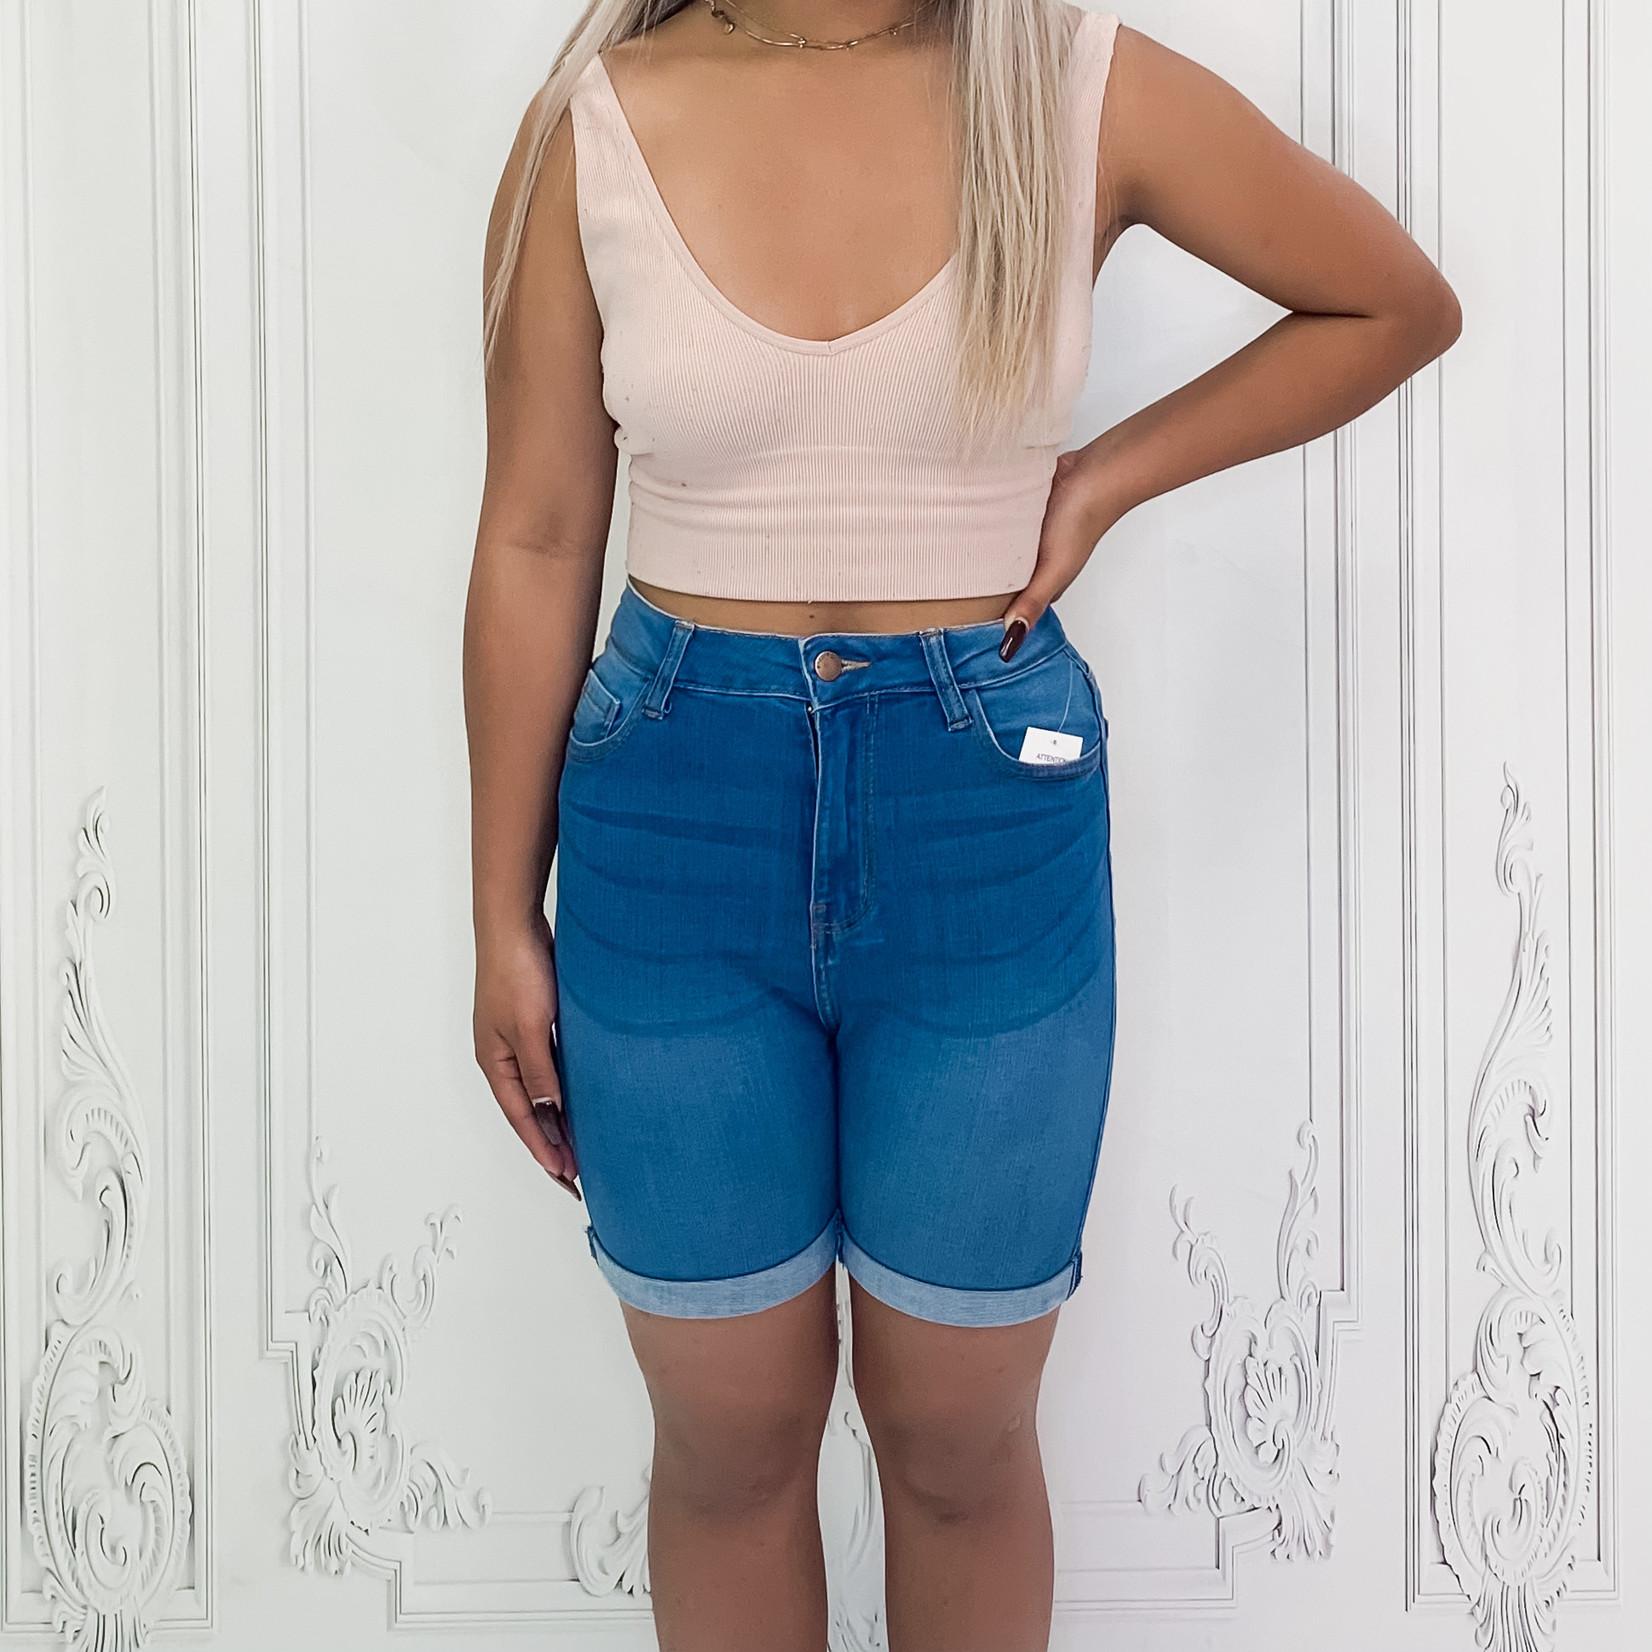 Evie midi rolled cuff shorts